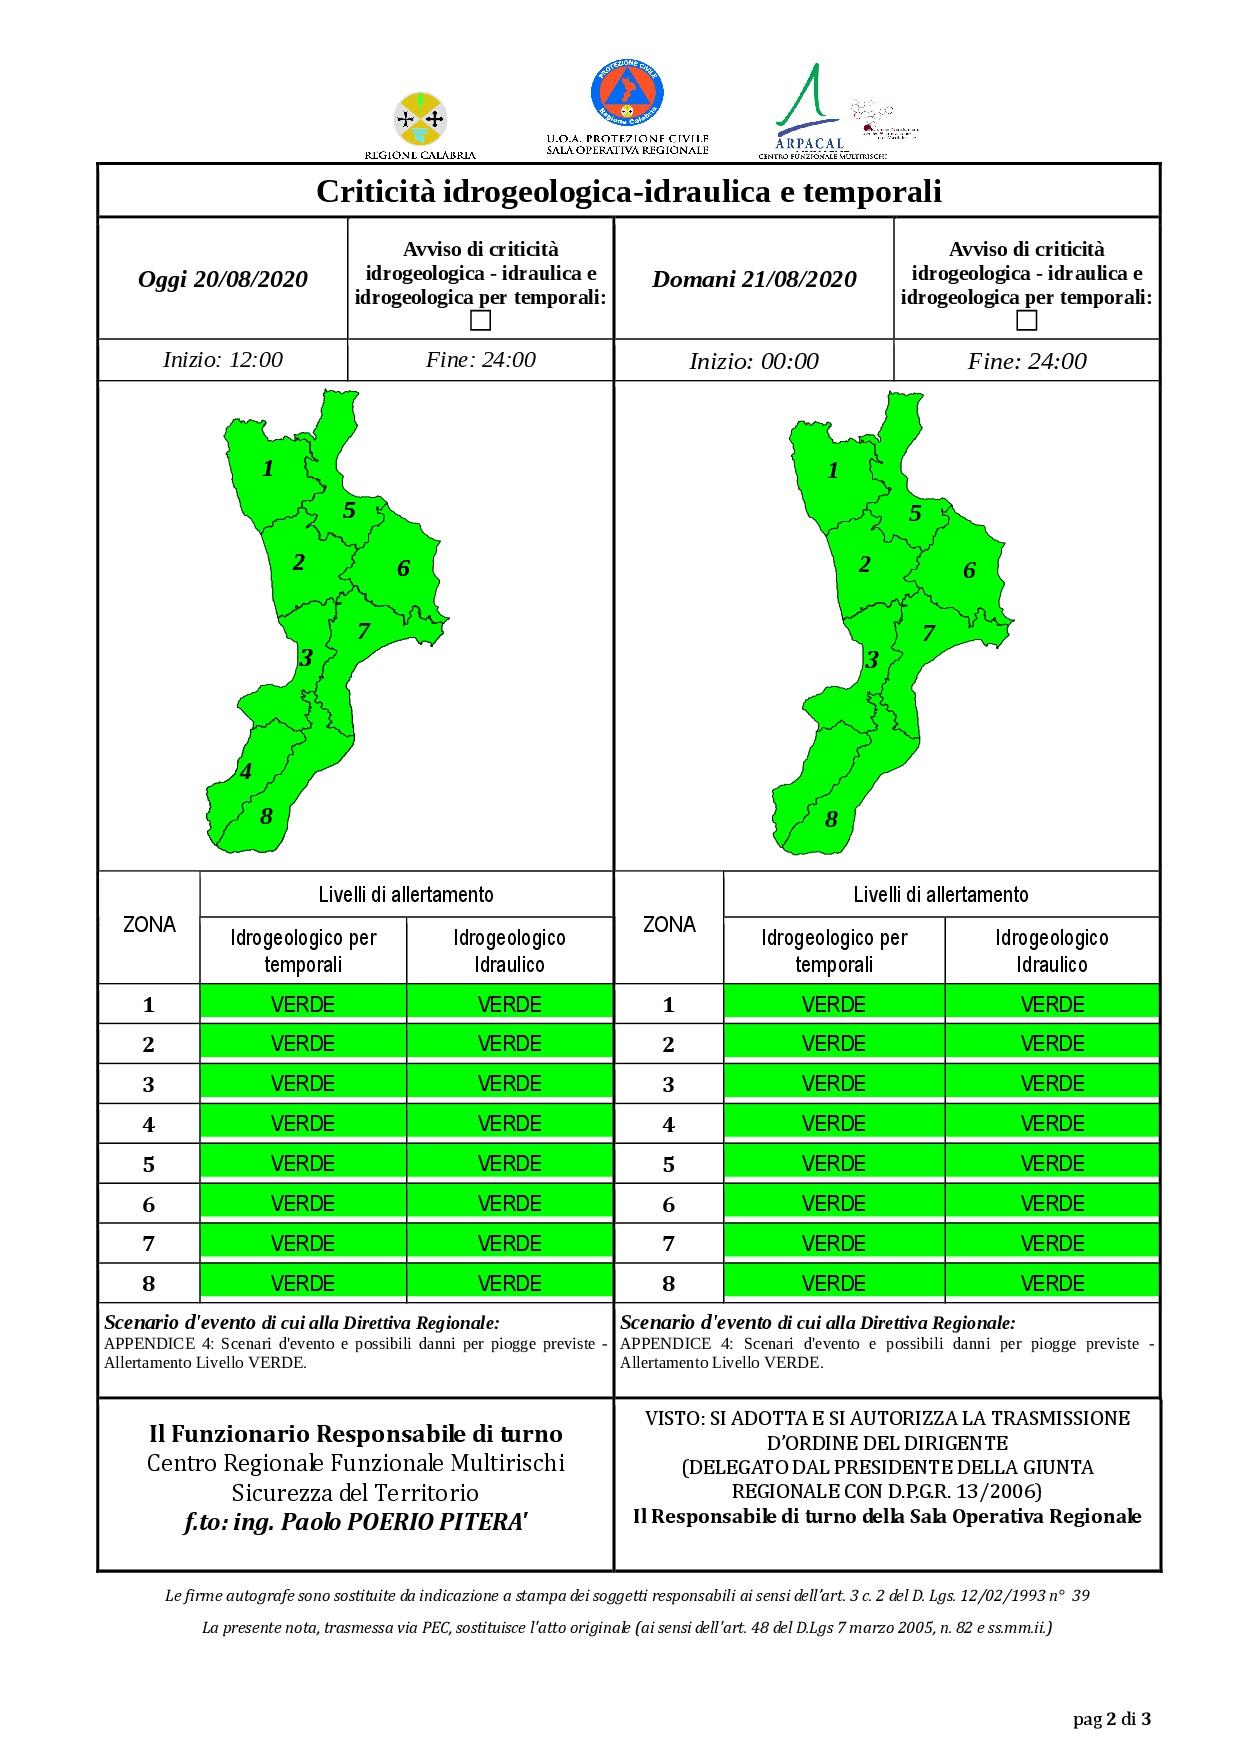 Criticità idrogeologica-idraulica e temporali in Calabria 20-08-2020